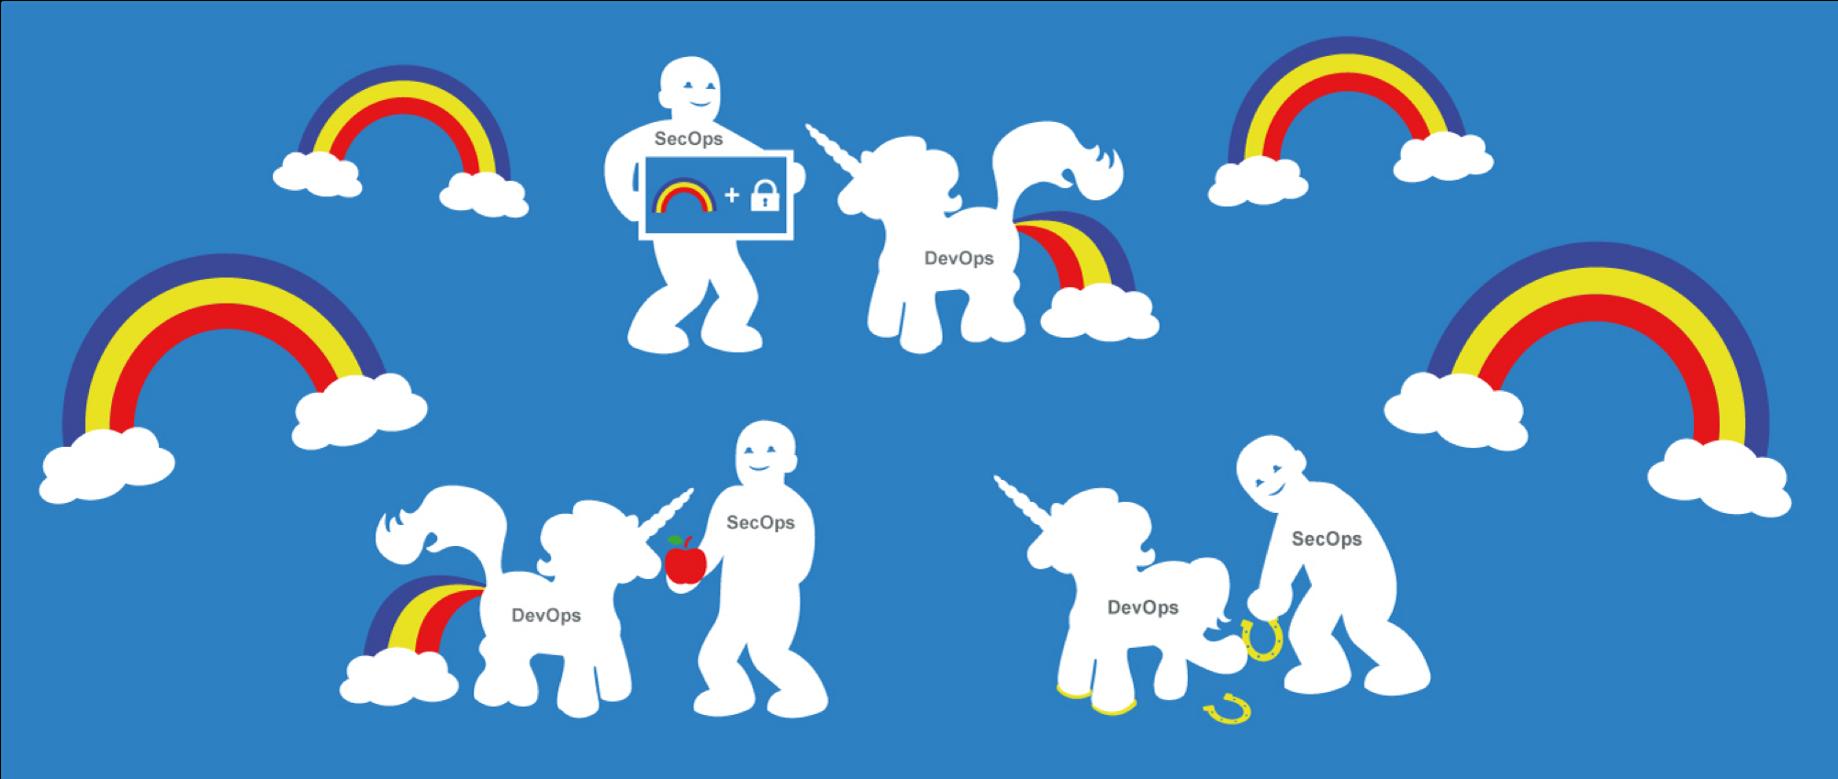 Unicorns don't just poop rainbows